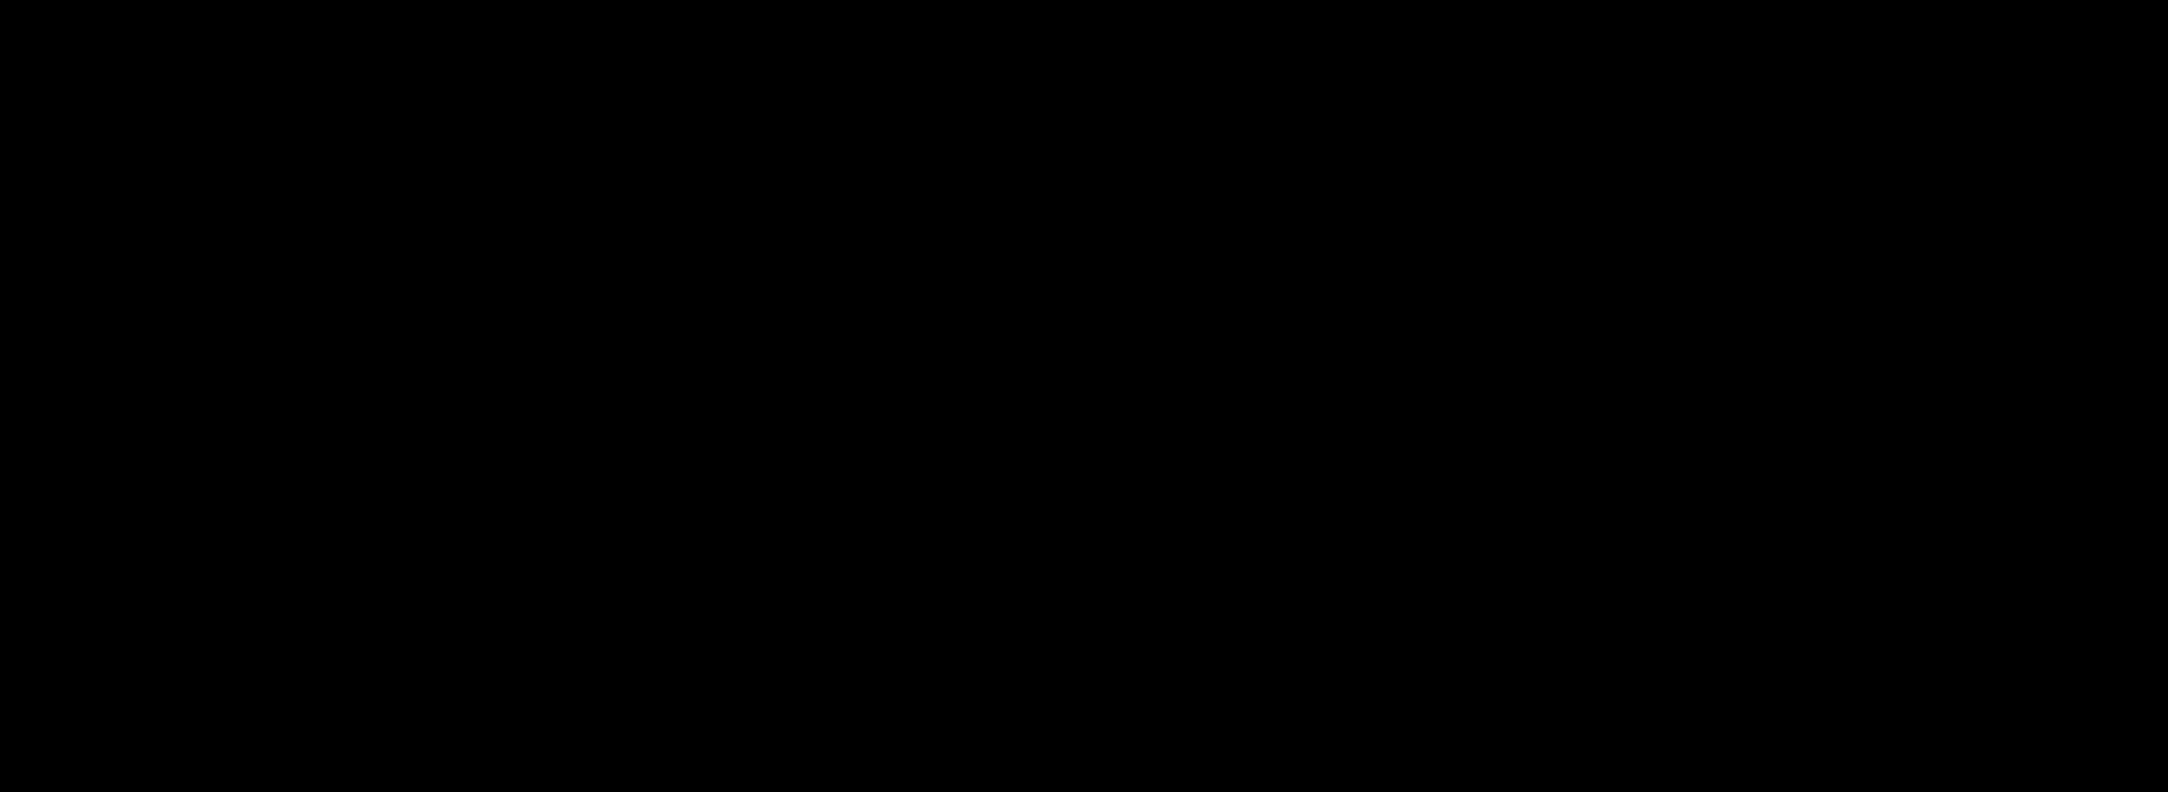 N-Biotinylcaproic acid